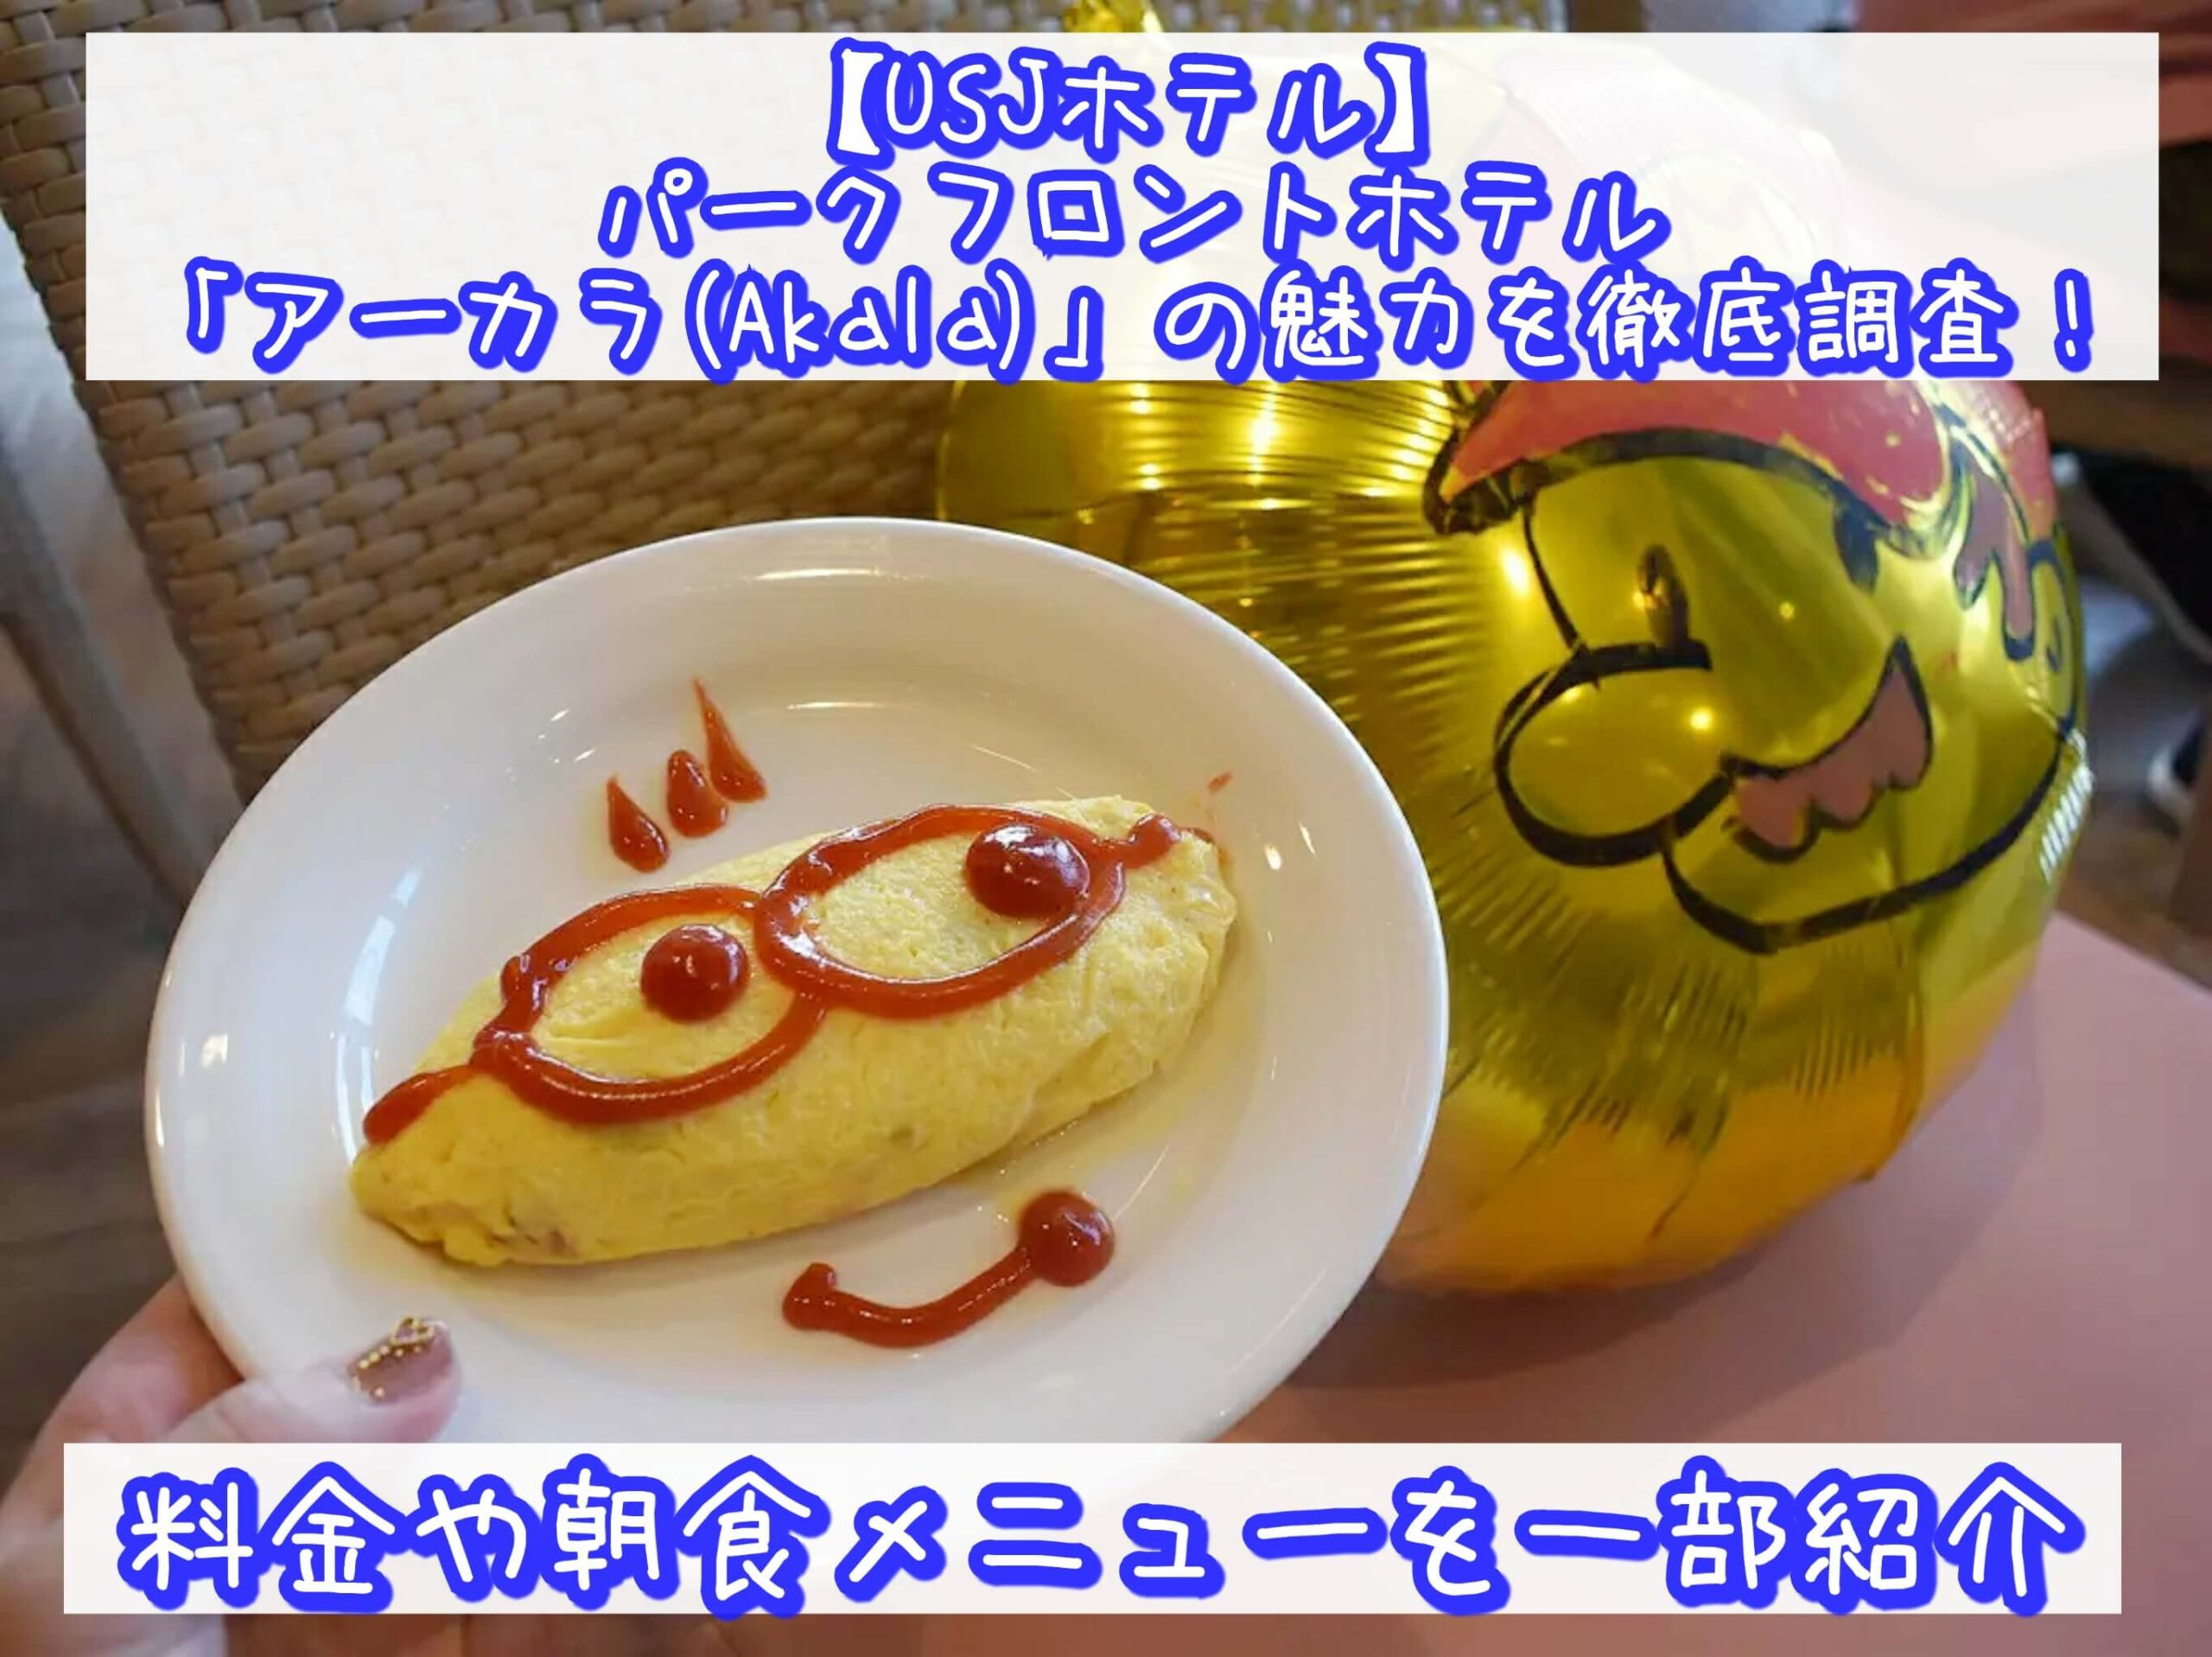 【USJホテル】パークフロントホテル「アーカラ(Akala)」の魅力を徹底調査!料金や朝食メニューを一部紹介